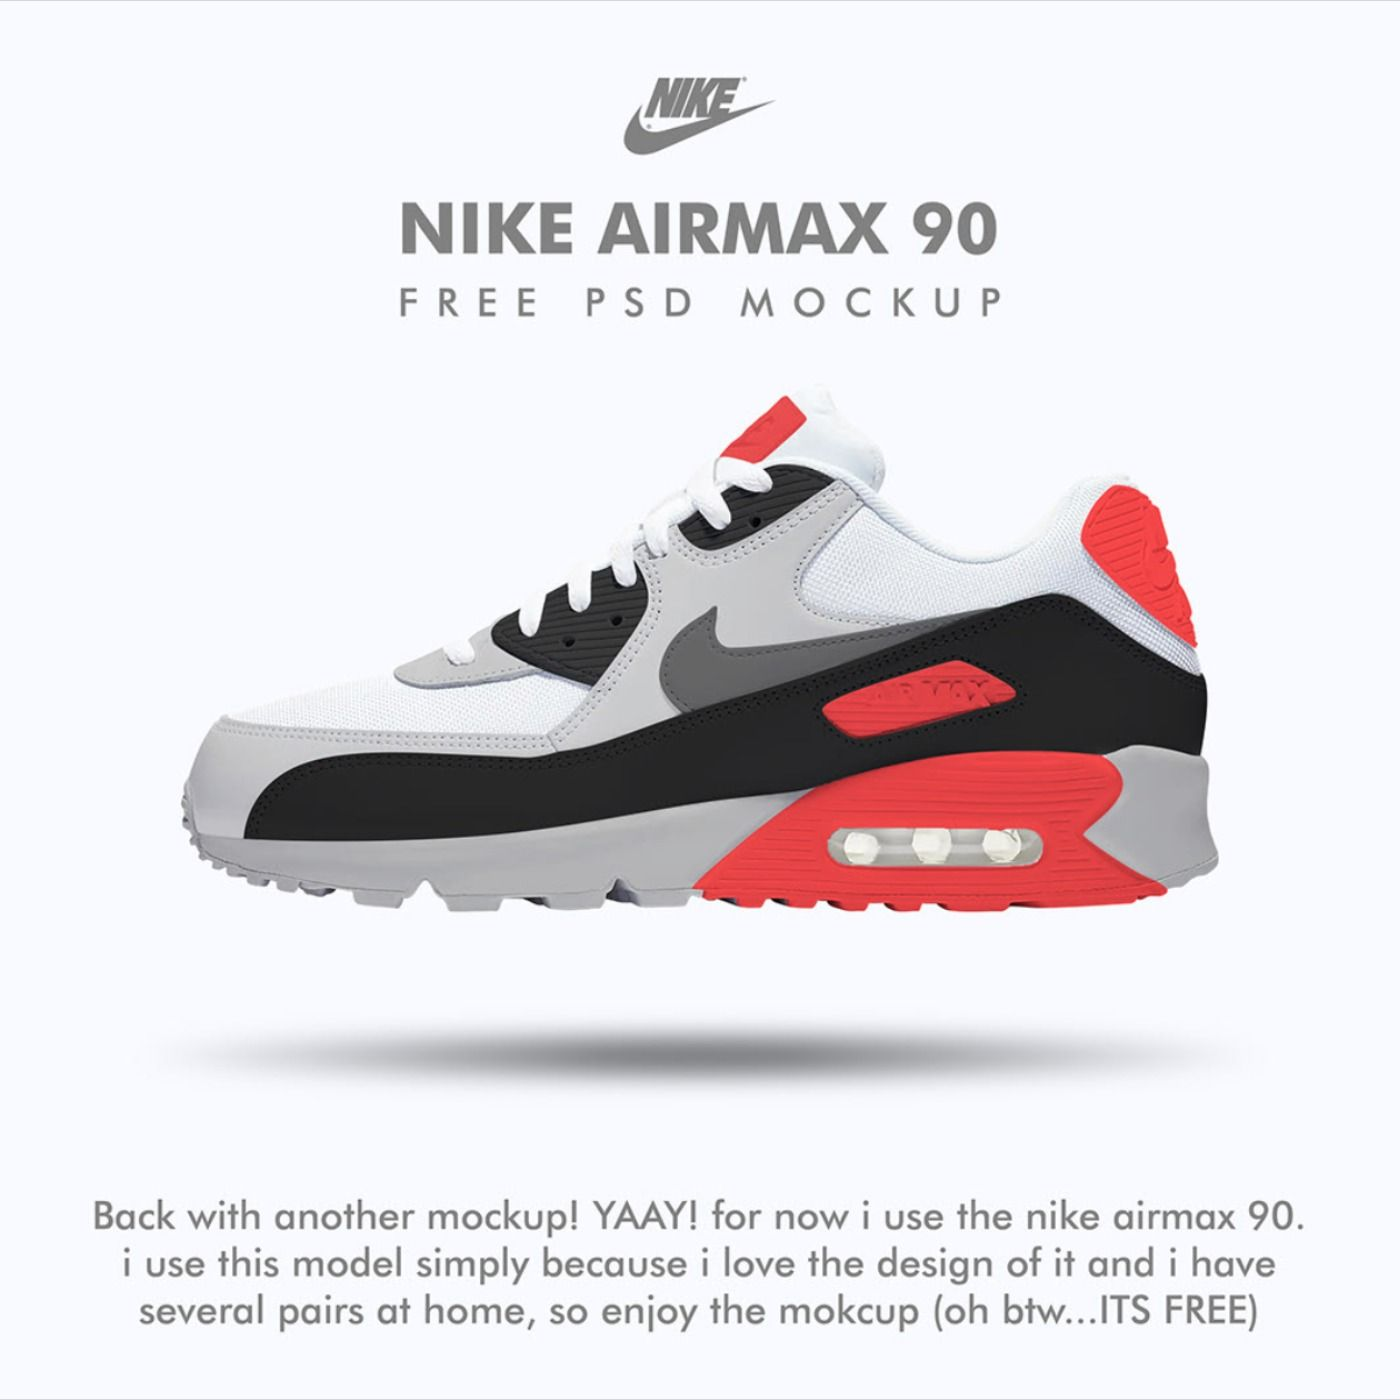 Nike Airmax 90 Free Psd Mockup Mockup Free Psd Mockup Psd Free Psd